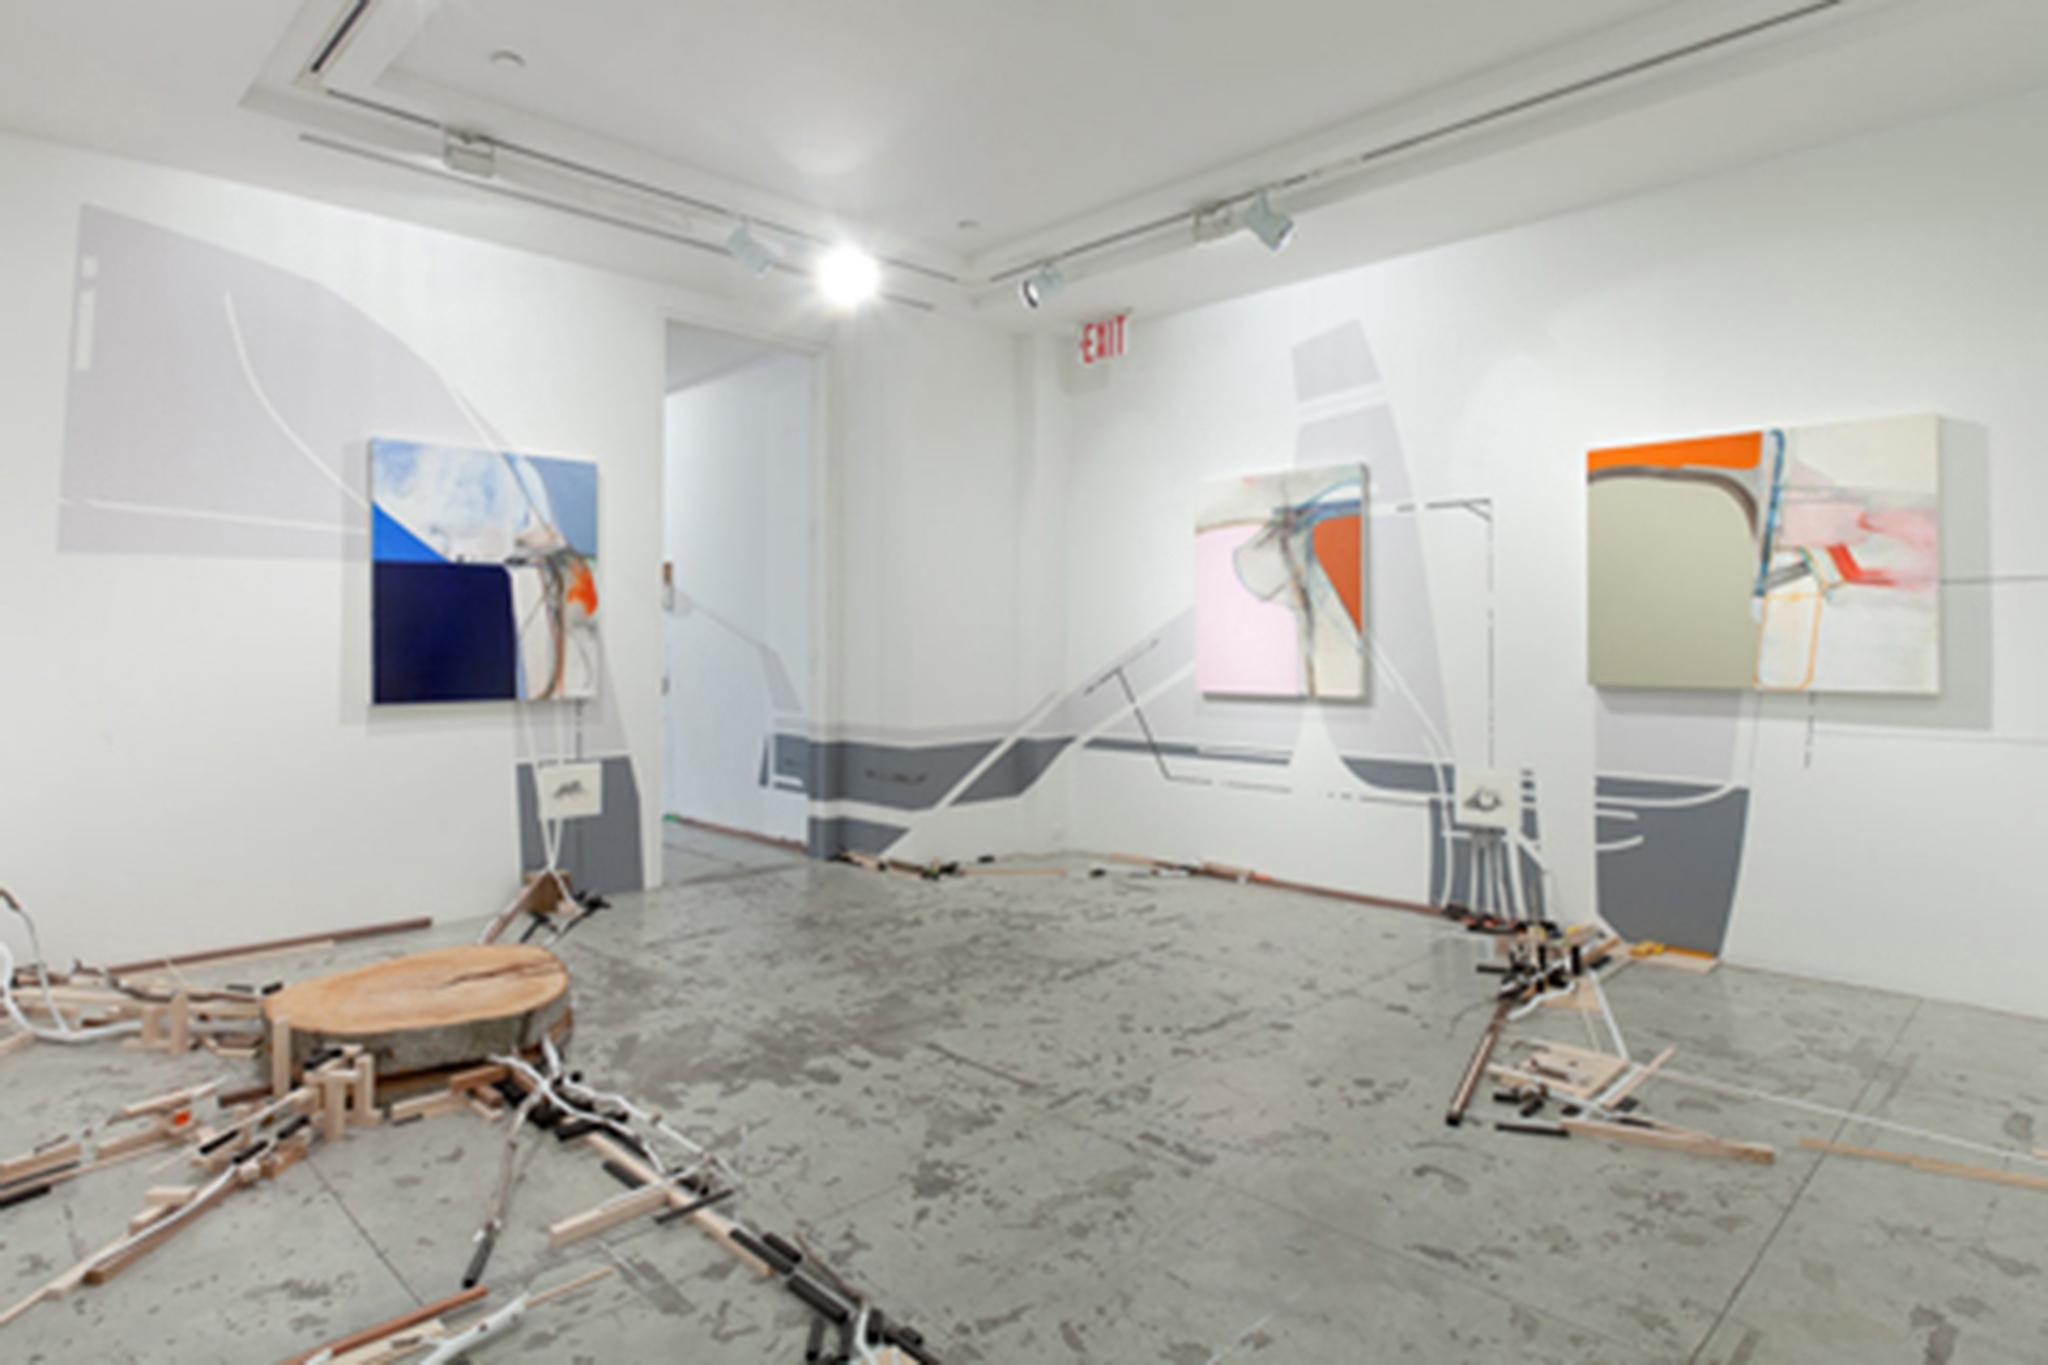 Jason McCoy Gallery